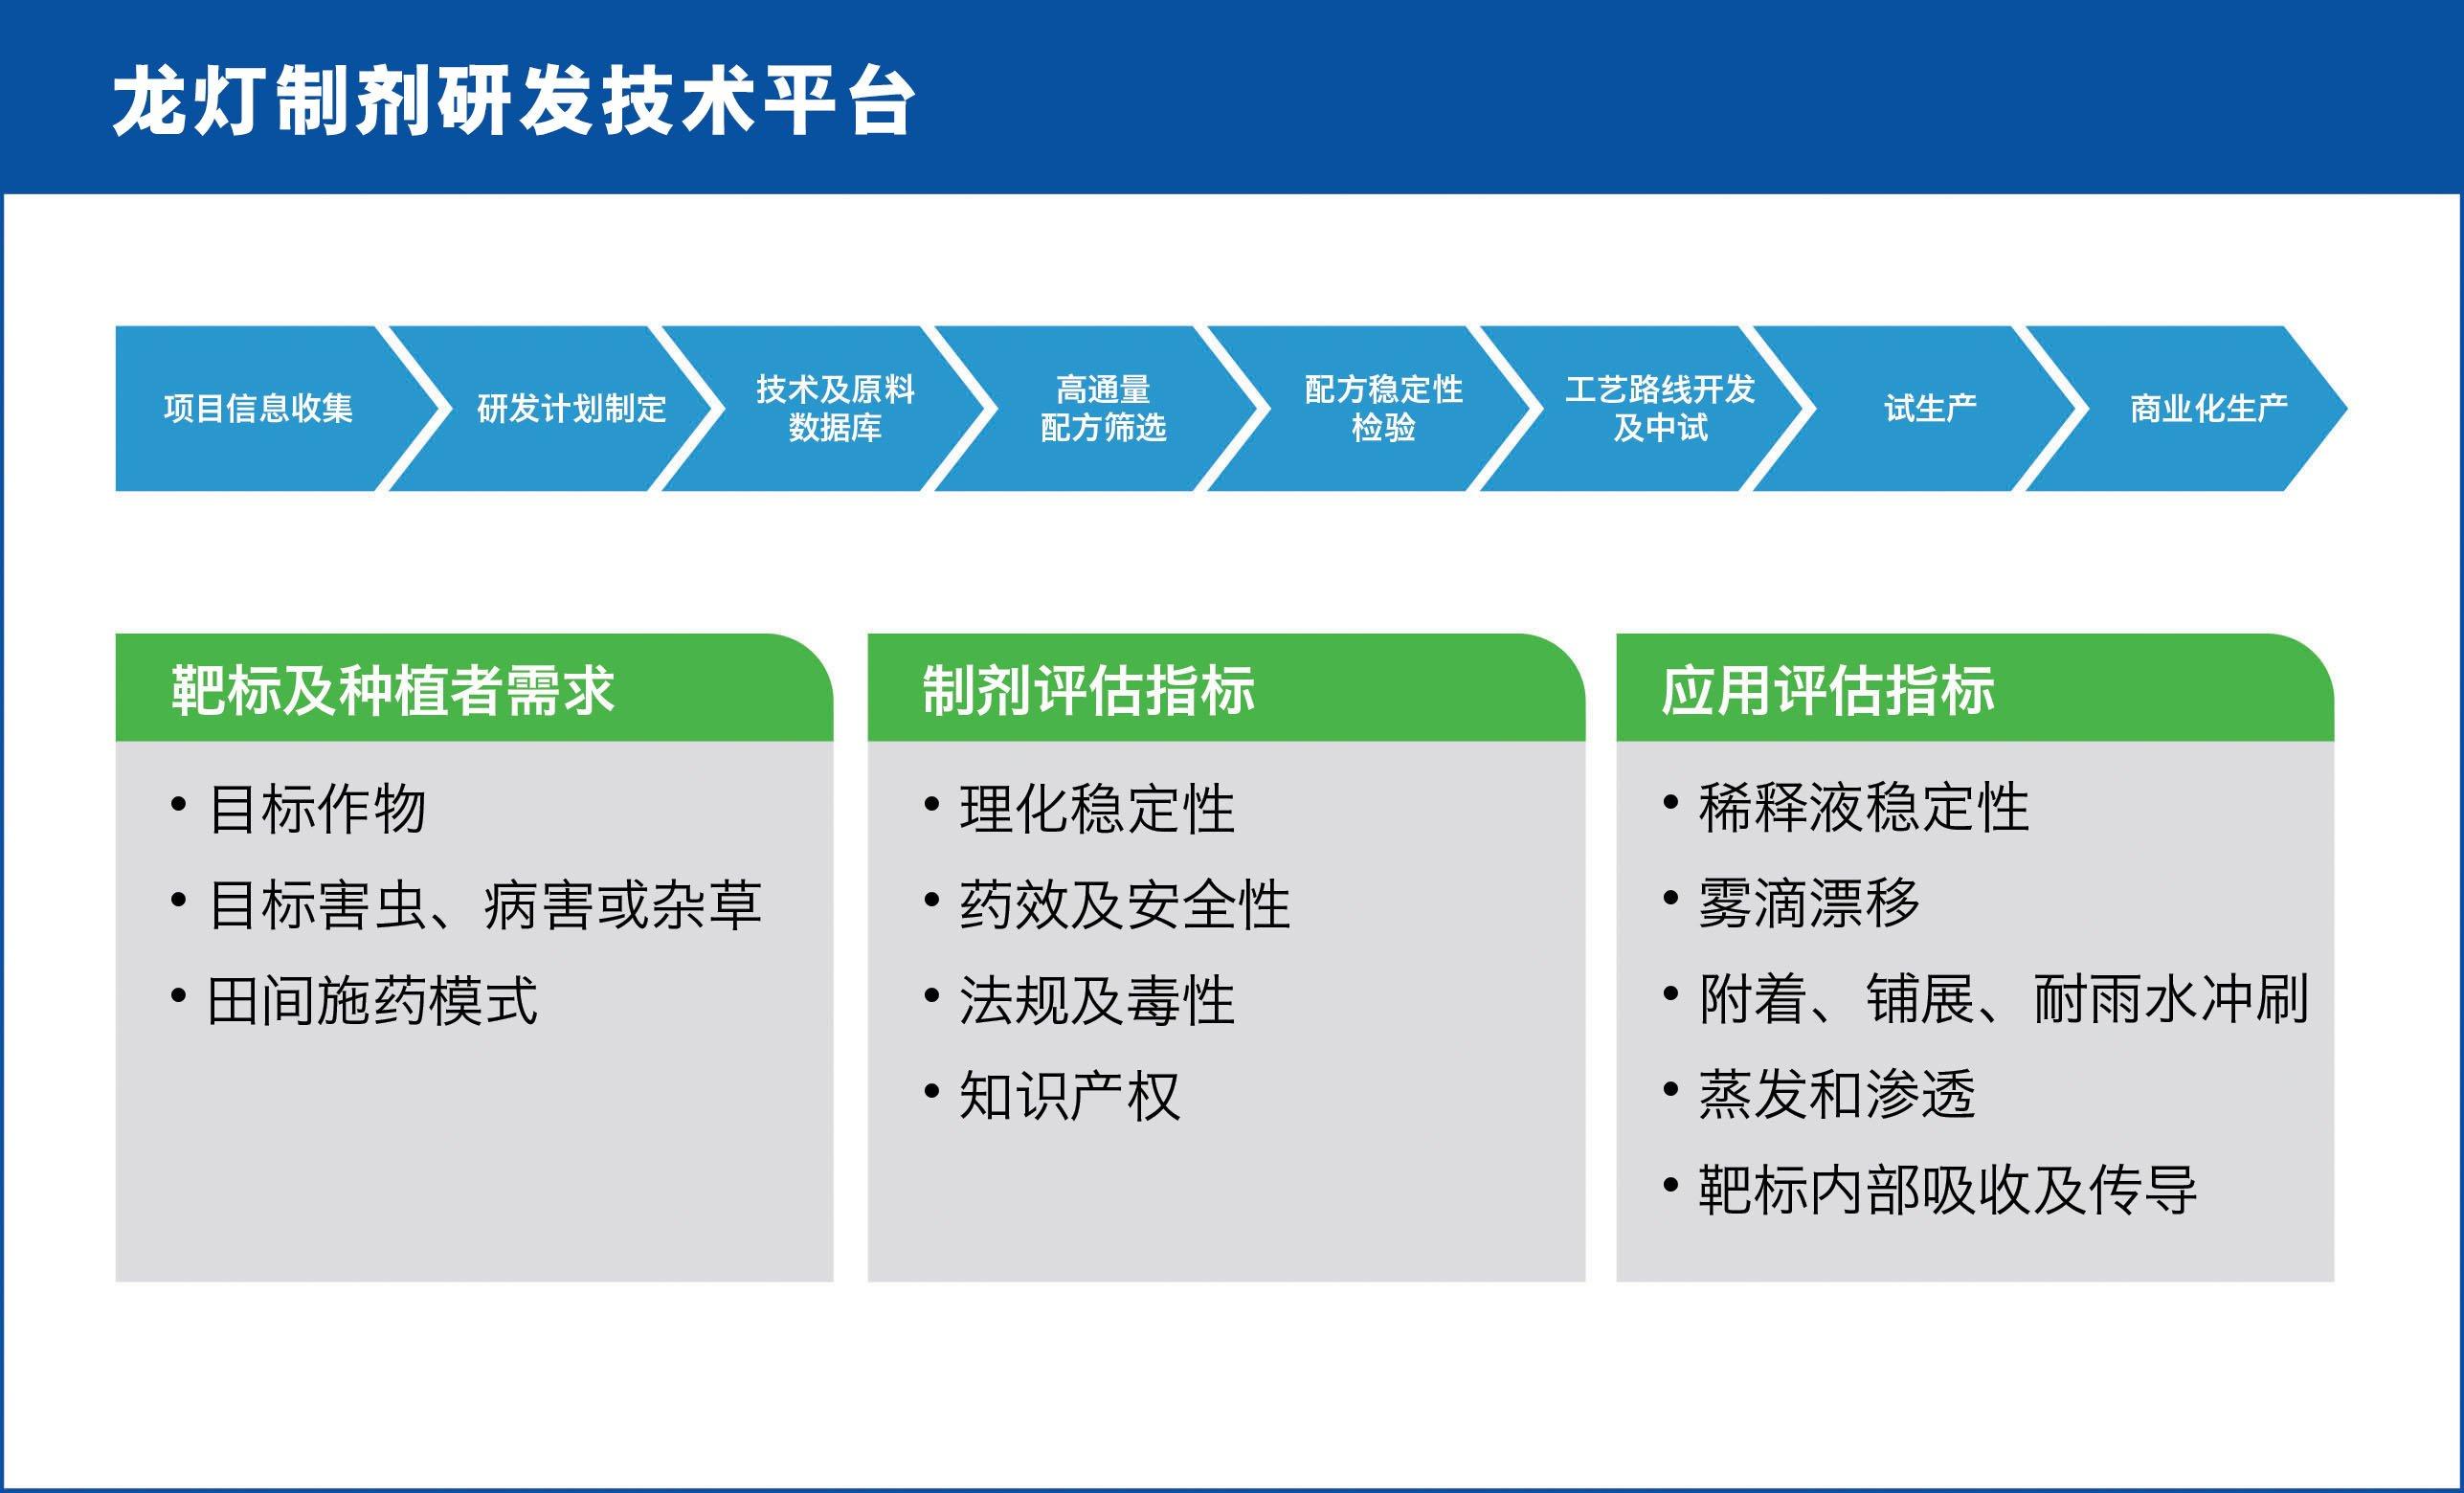 Principle & process of formulation development at Rotam - China